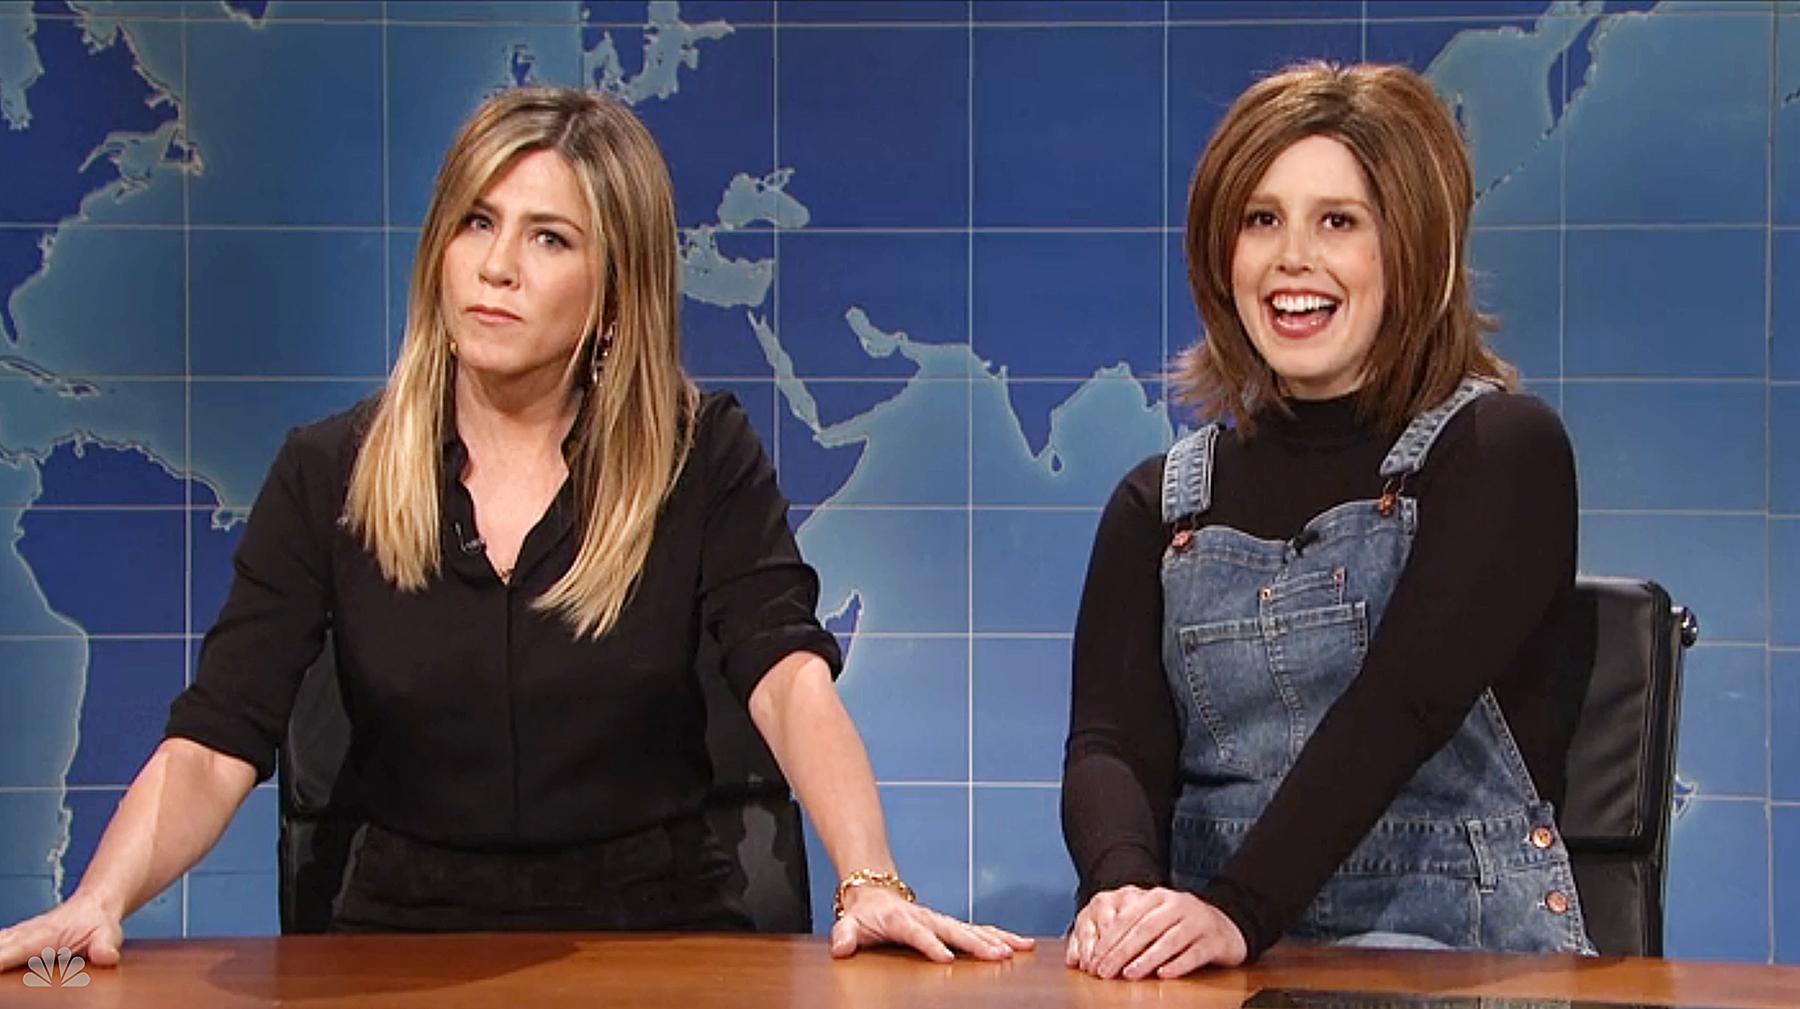 Jennifer Aniston Vanessa Bayer Saturday Night Live SNL Friends